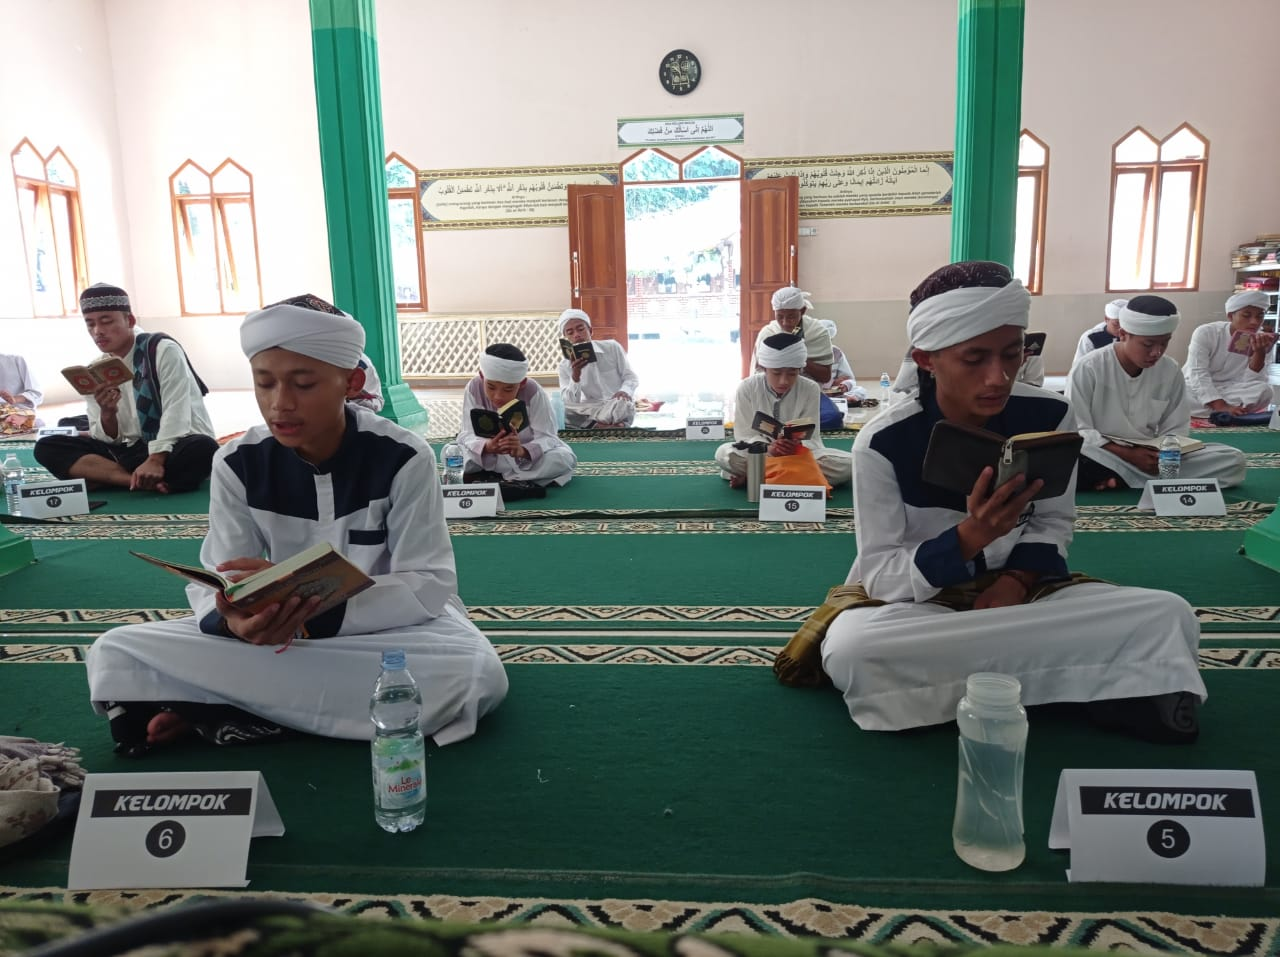 Sambut Hari Kemerdekaan, Al Fath Gelar 75 Kali Santri Khatamkan Quran